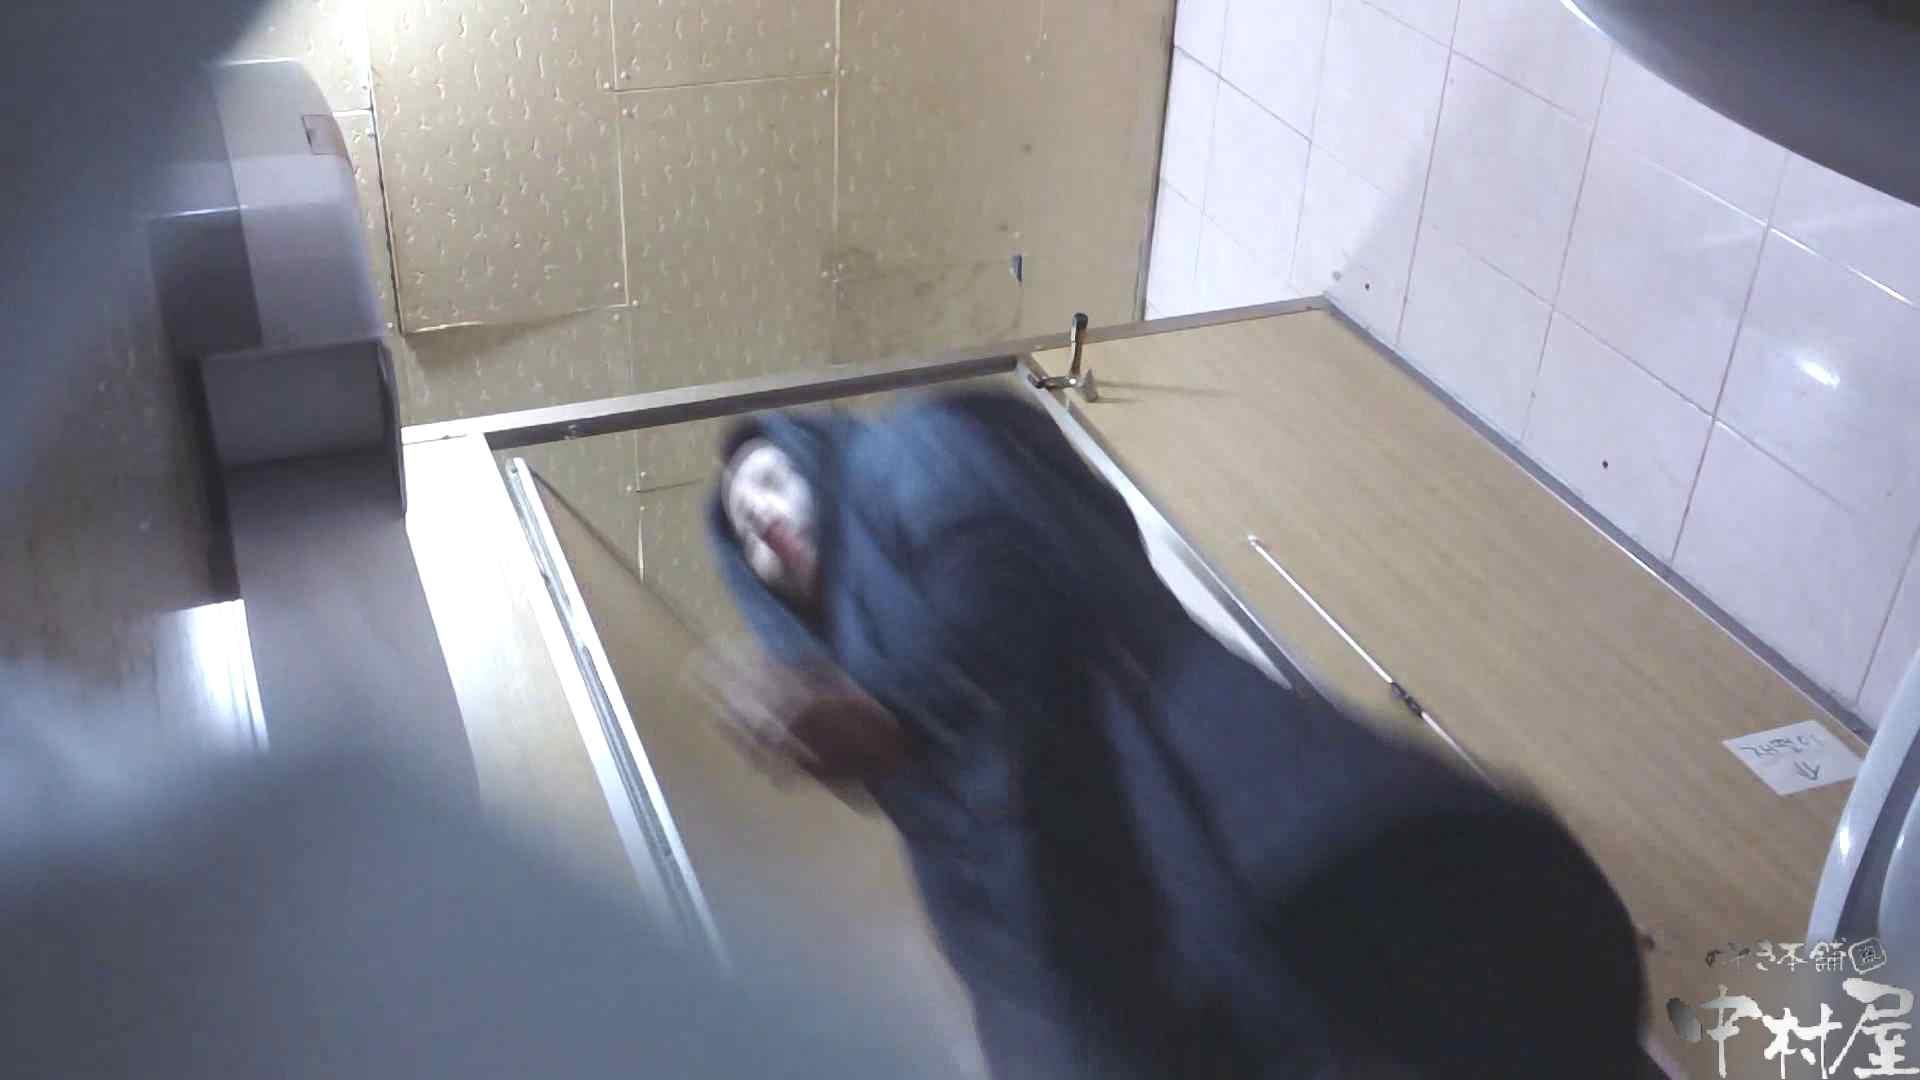 韓流トイレ盗撮vol.11 韓流 | 盗撮  47連発 41